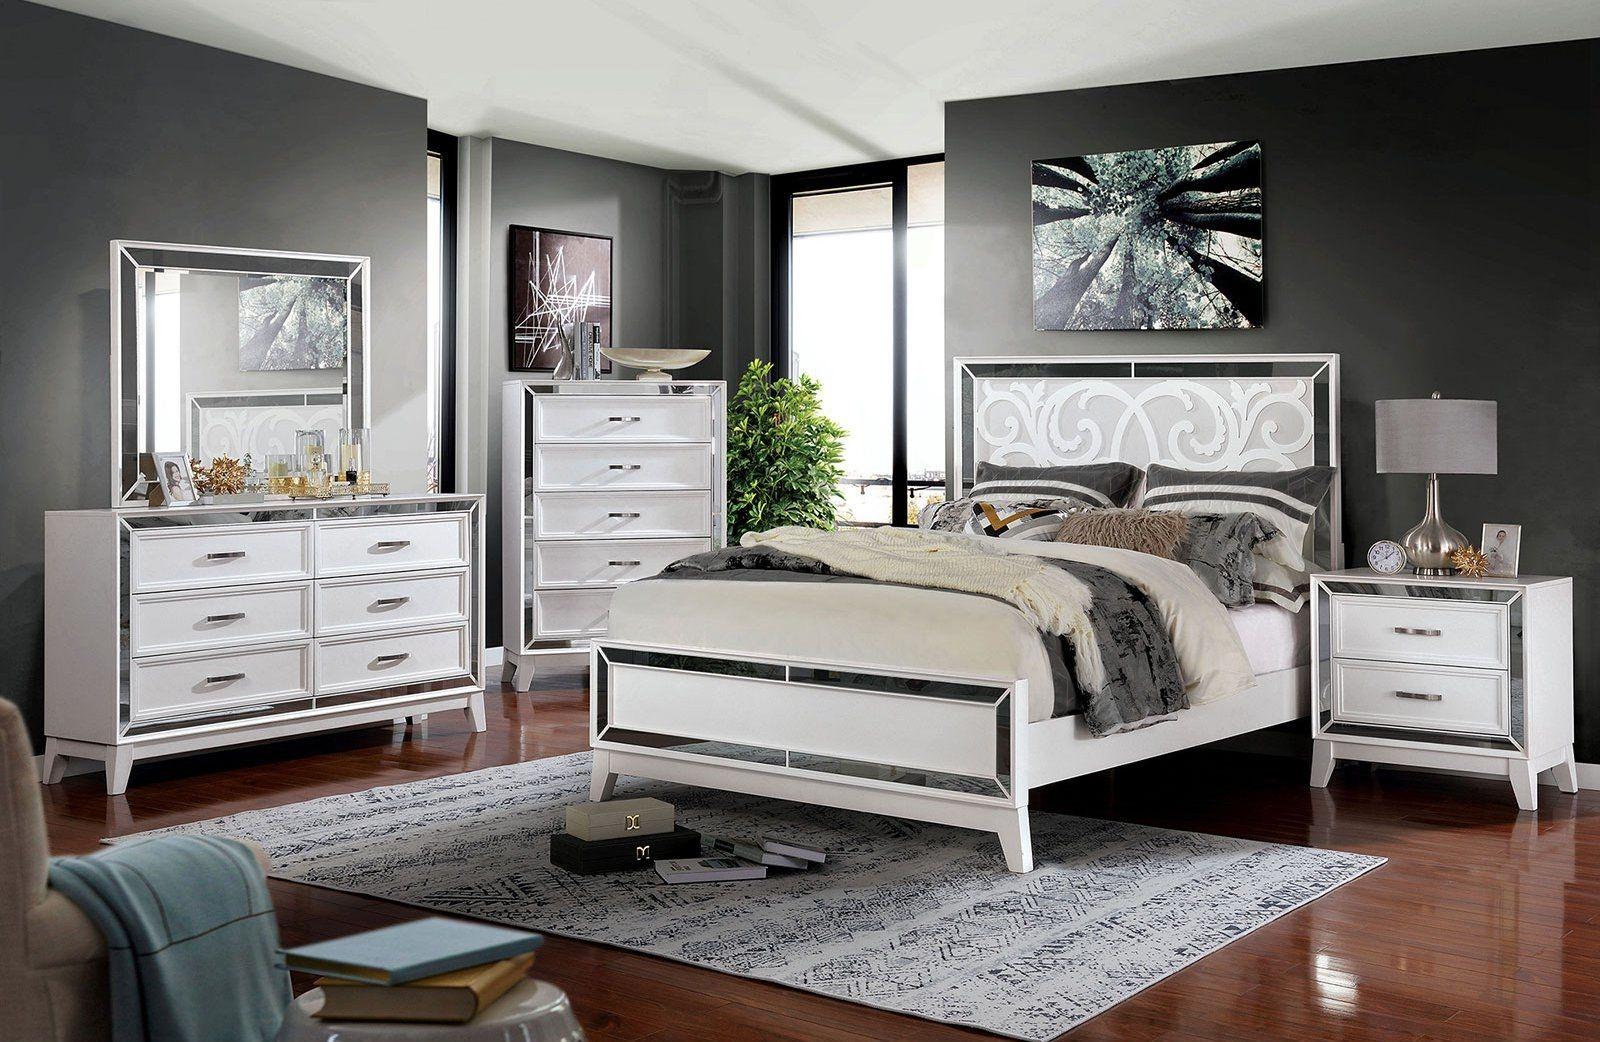 Furniture Of America Lamego White/mirrored Contemporary